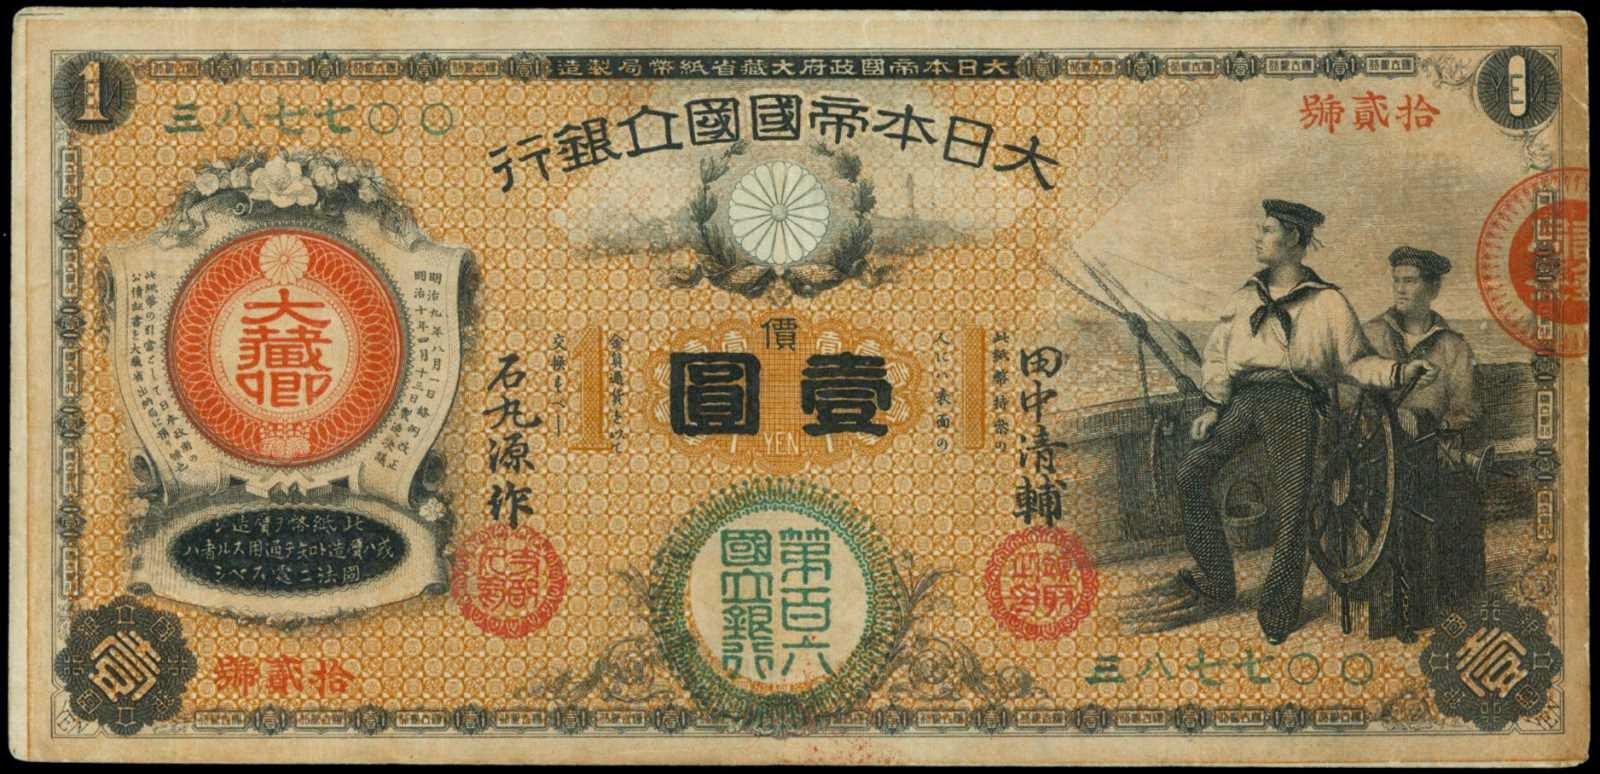 Japan Banknotes 1 Yen Sailors 1877 Great Imperial Japanese National Bank